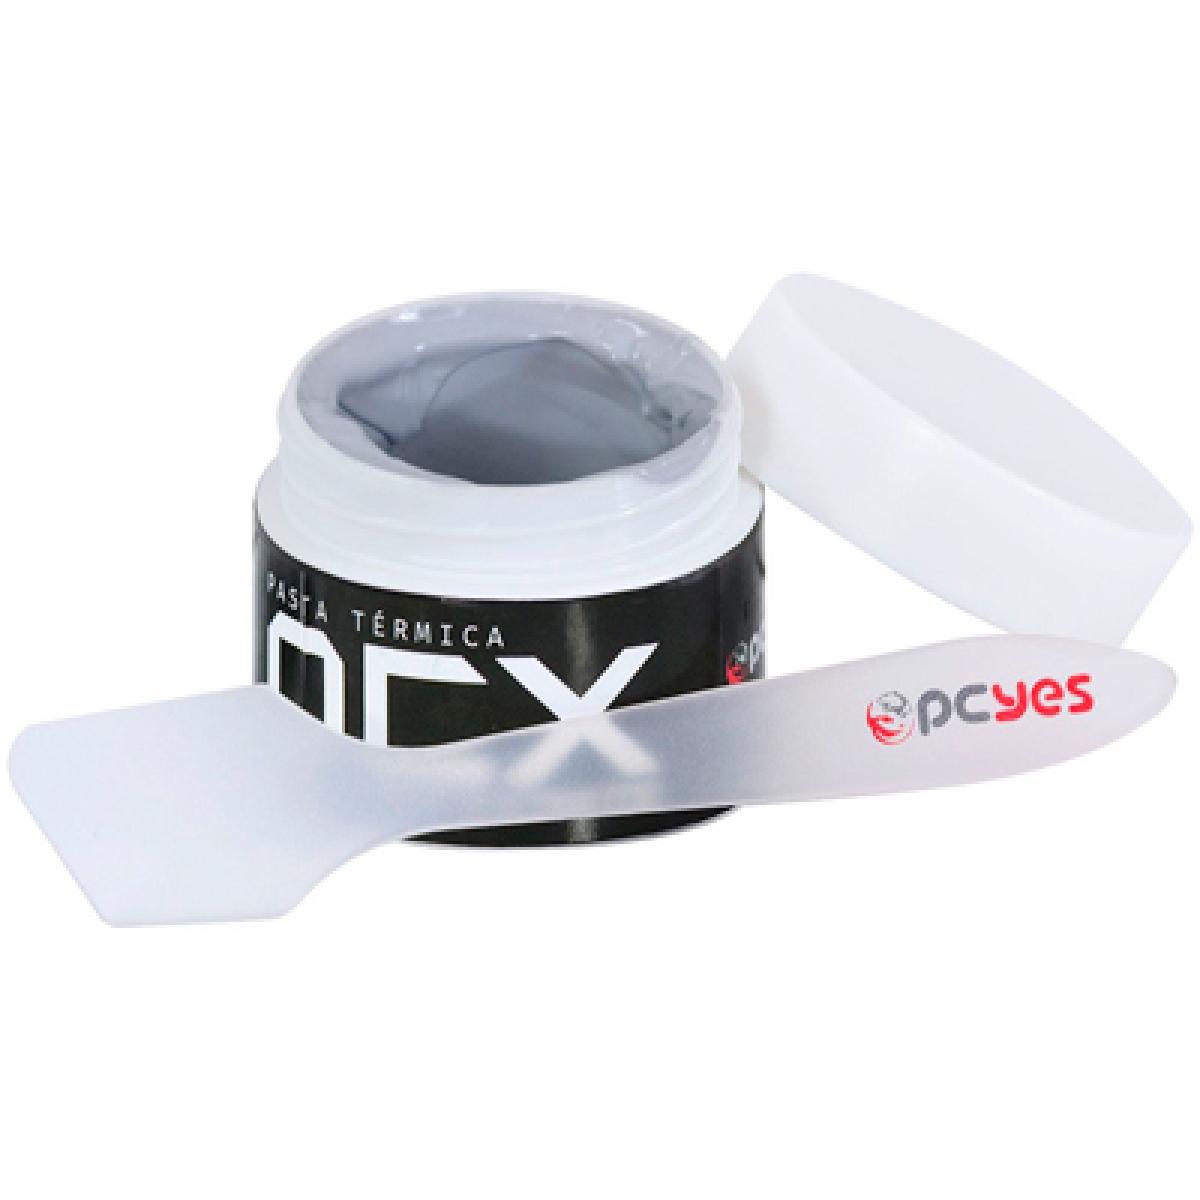 Pasta Térmica OCX 10G Gelid - OCX10GLD - By Pcyes